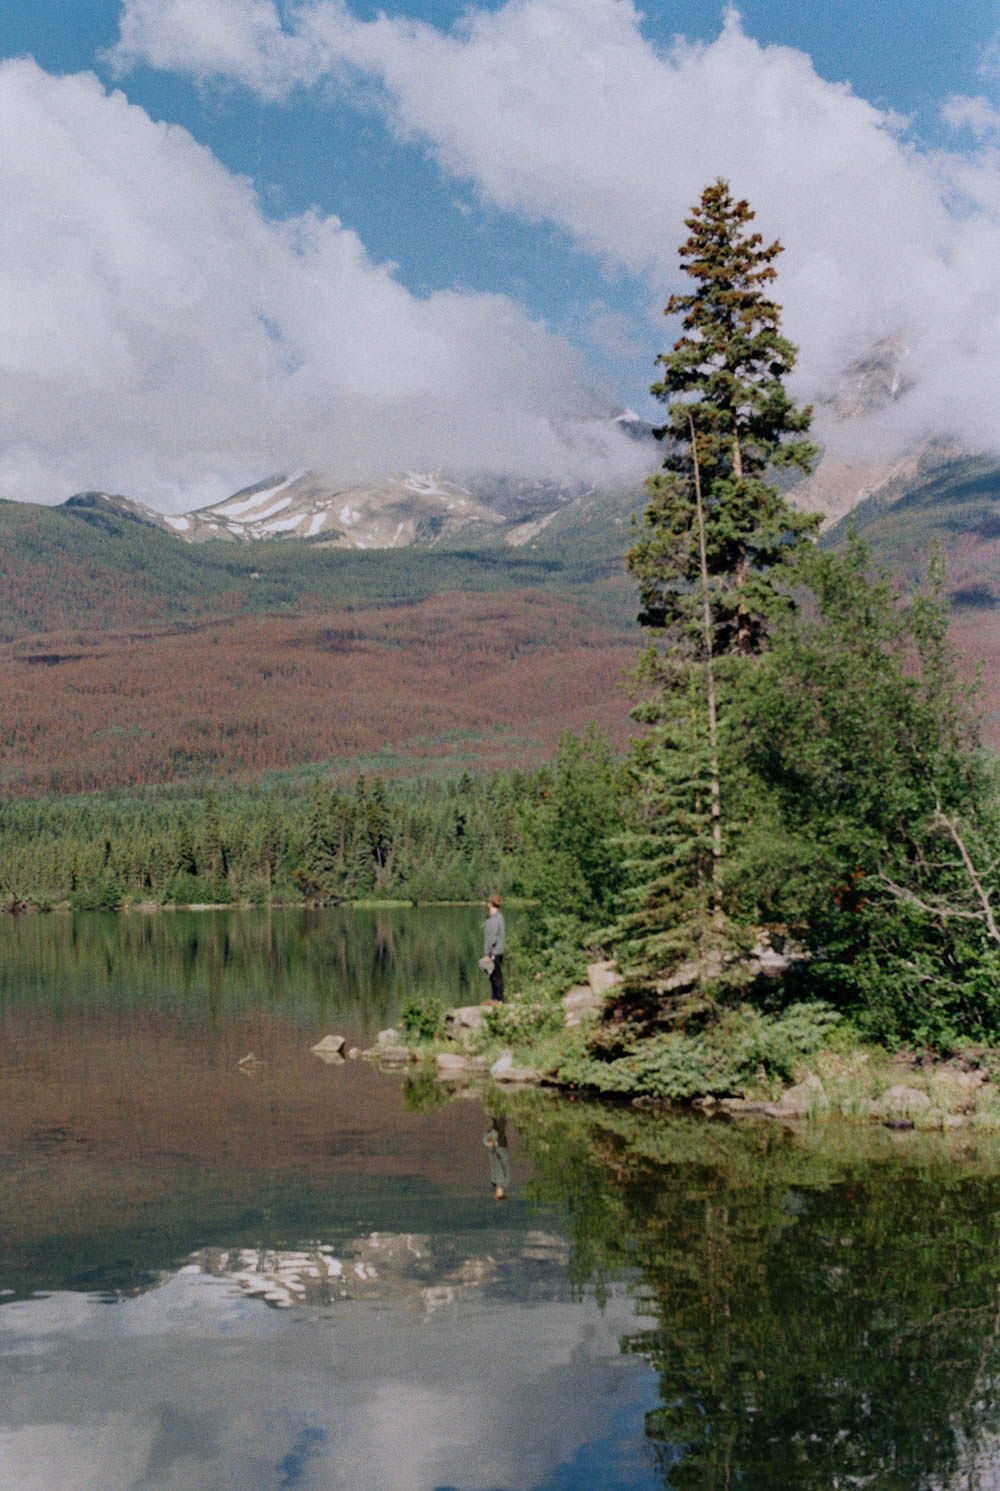 © Cottage Hill, LLC | cottagehill.co | Canadian Rockies60.jpg